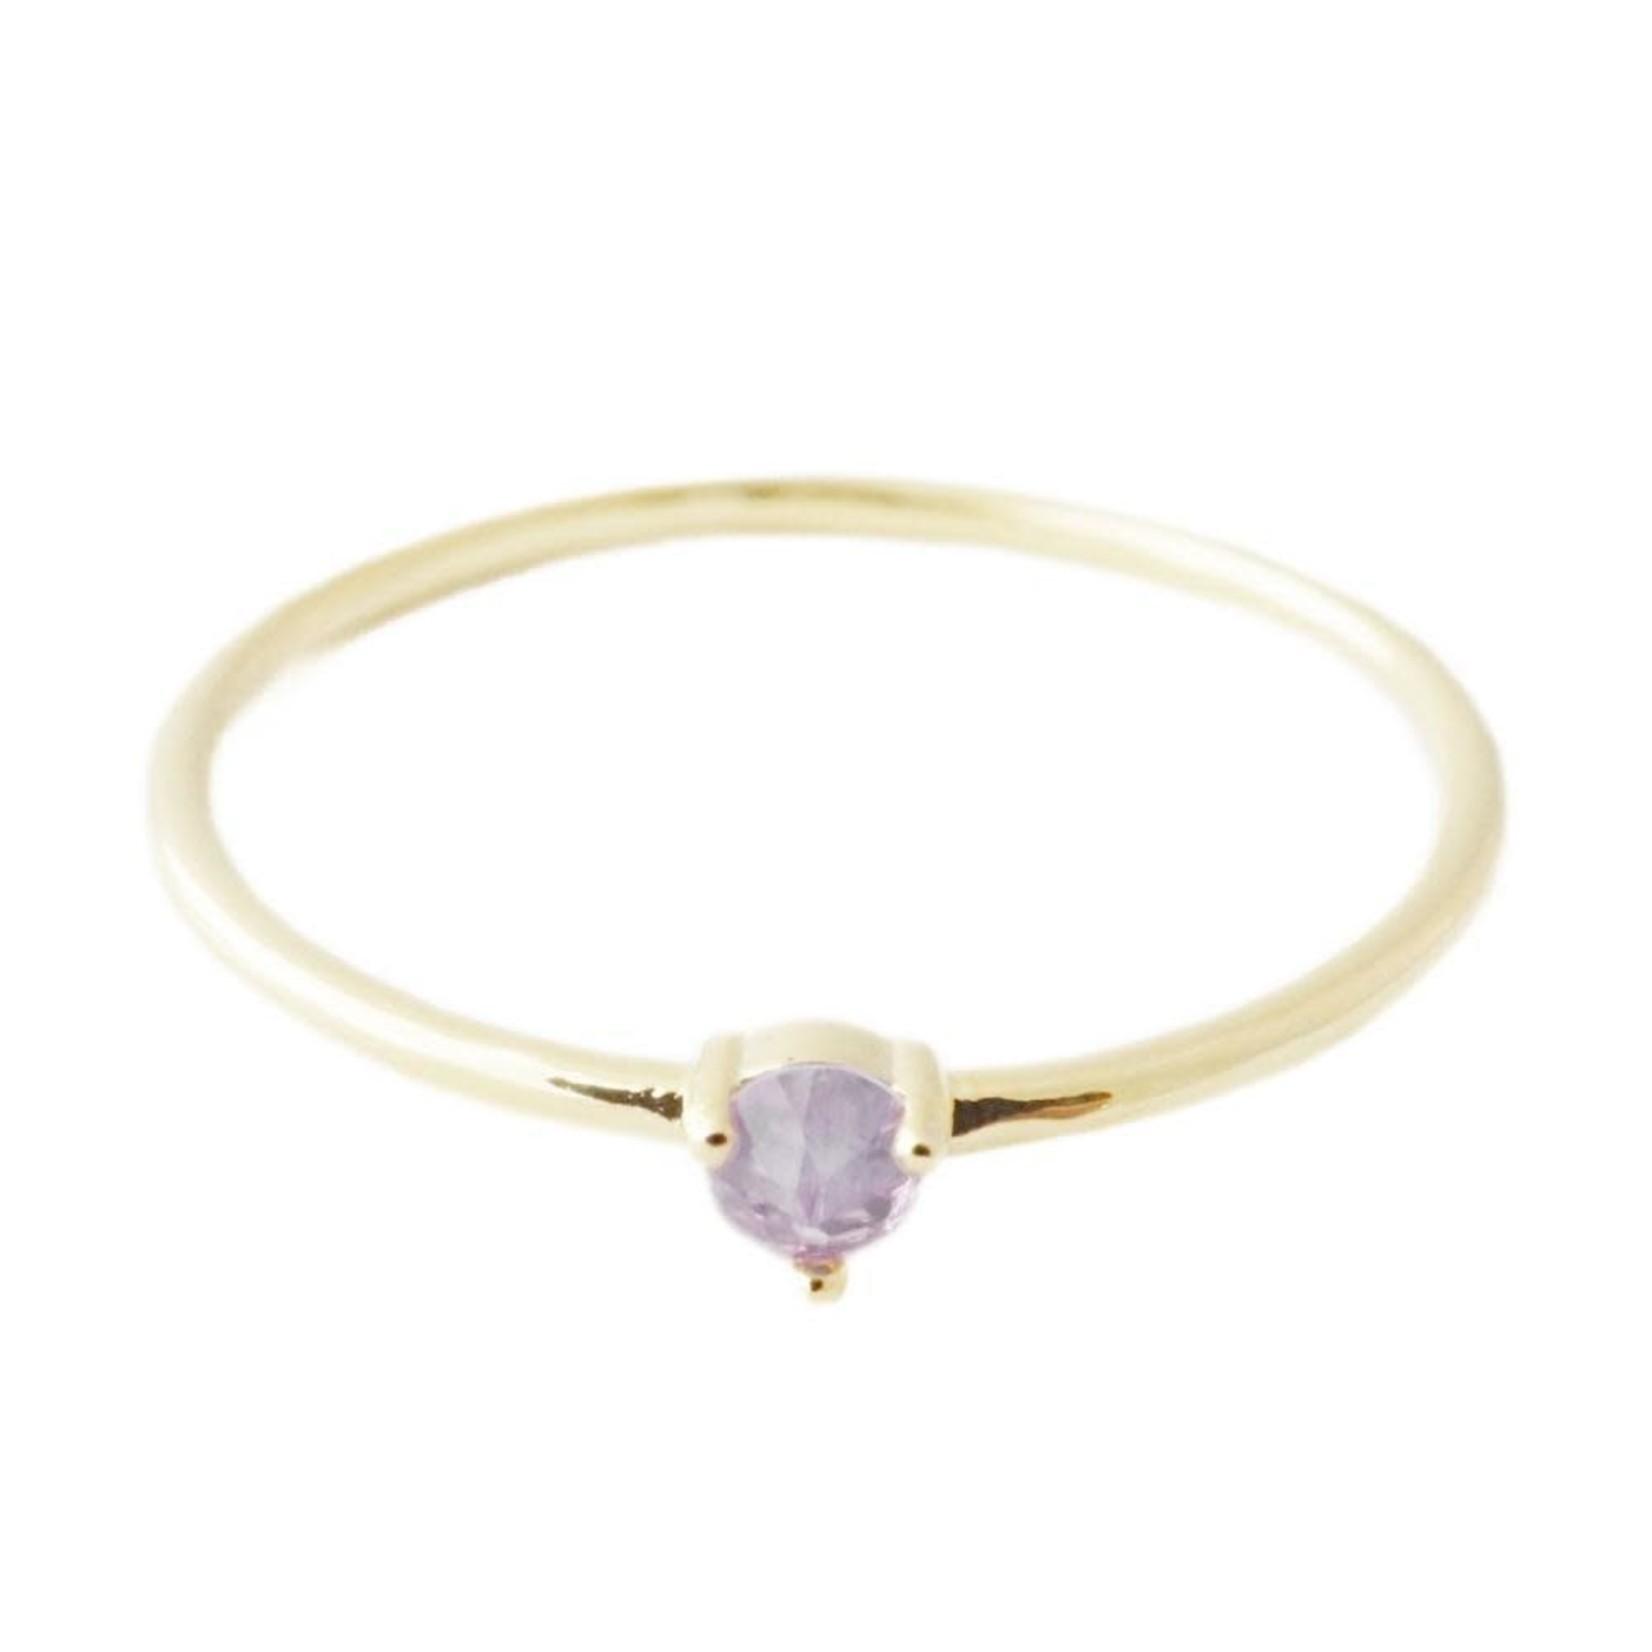 Honeycat Jewelry Honeycat Solitaire Ring AMETHYST Gold